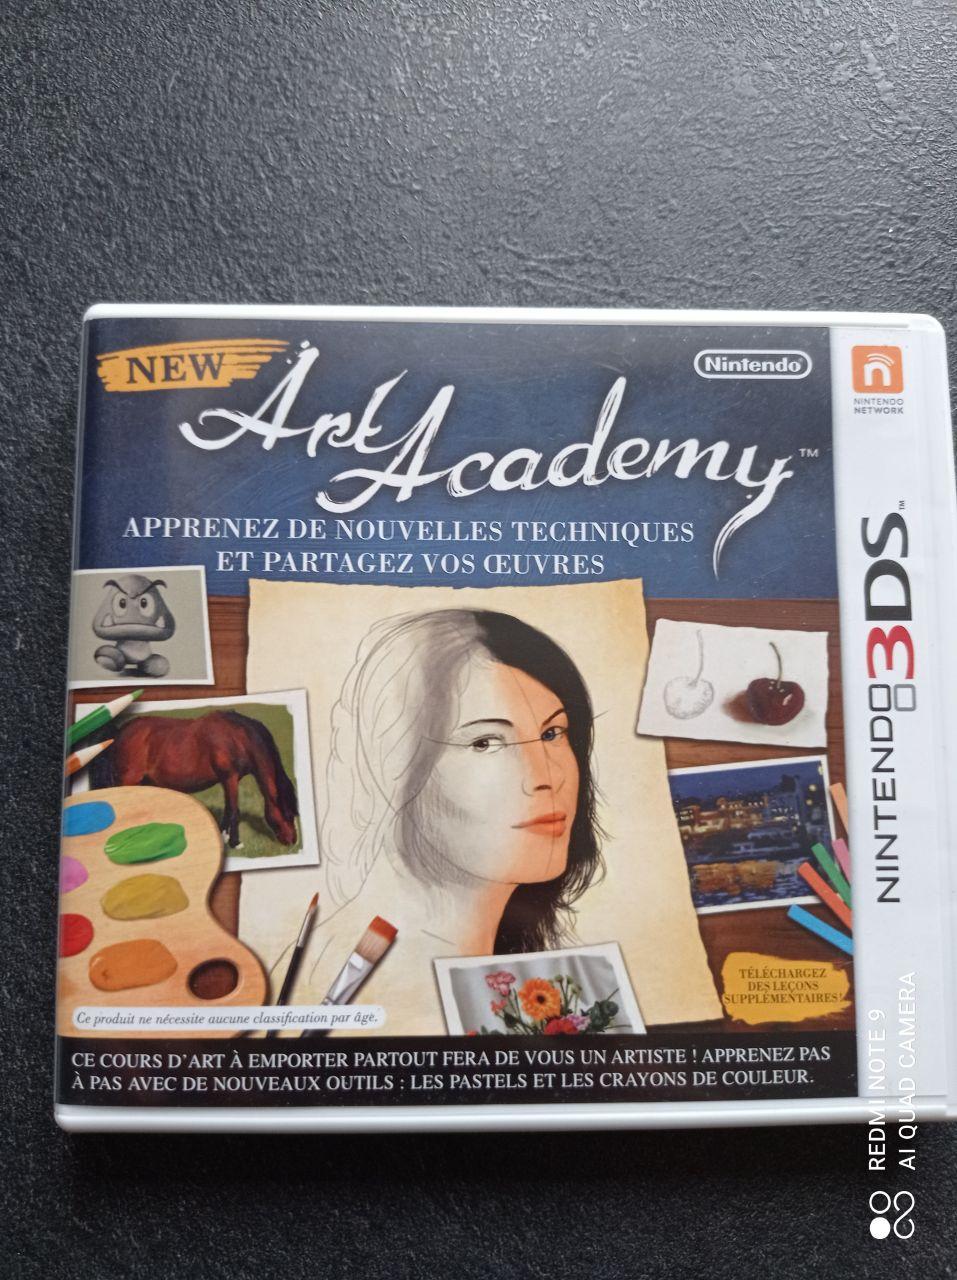 Image article Nintendo - 3DS - New art academy